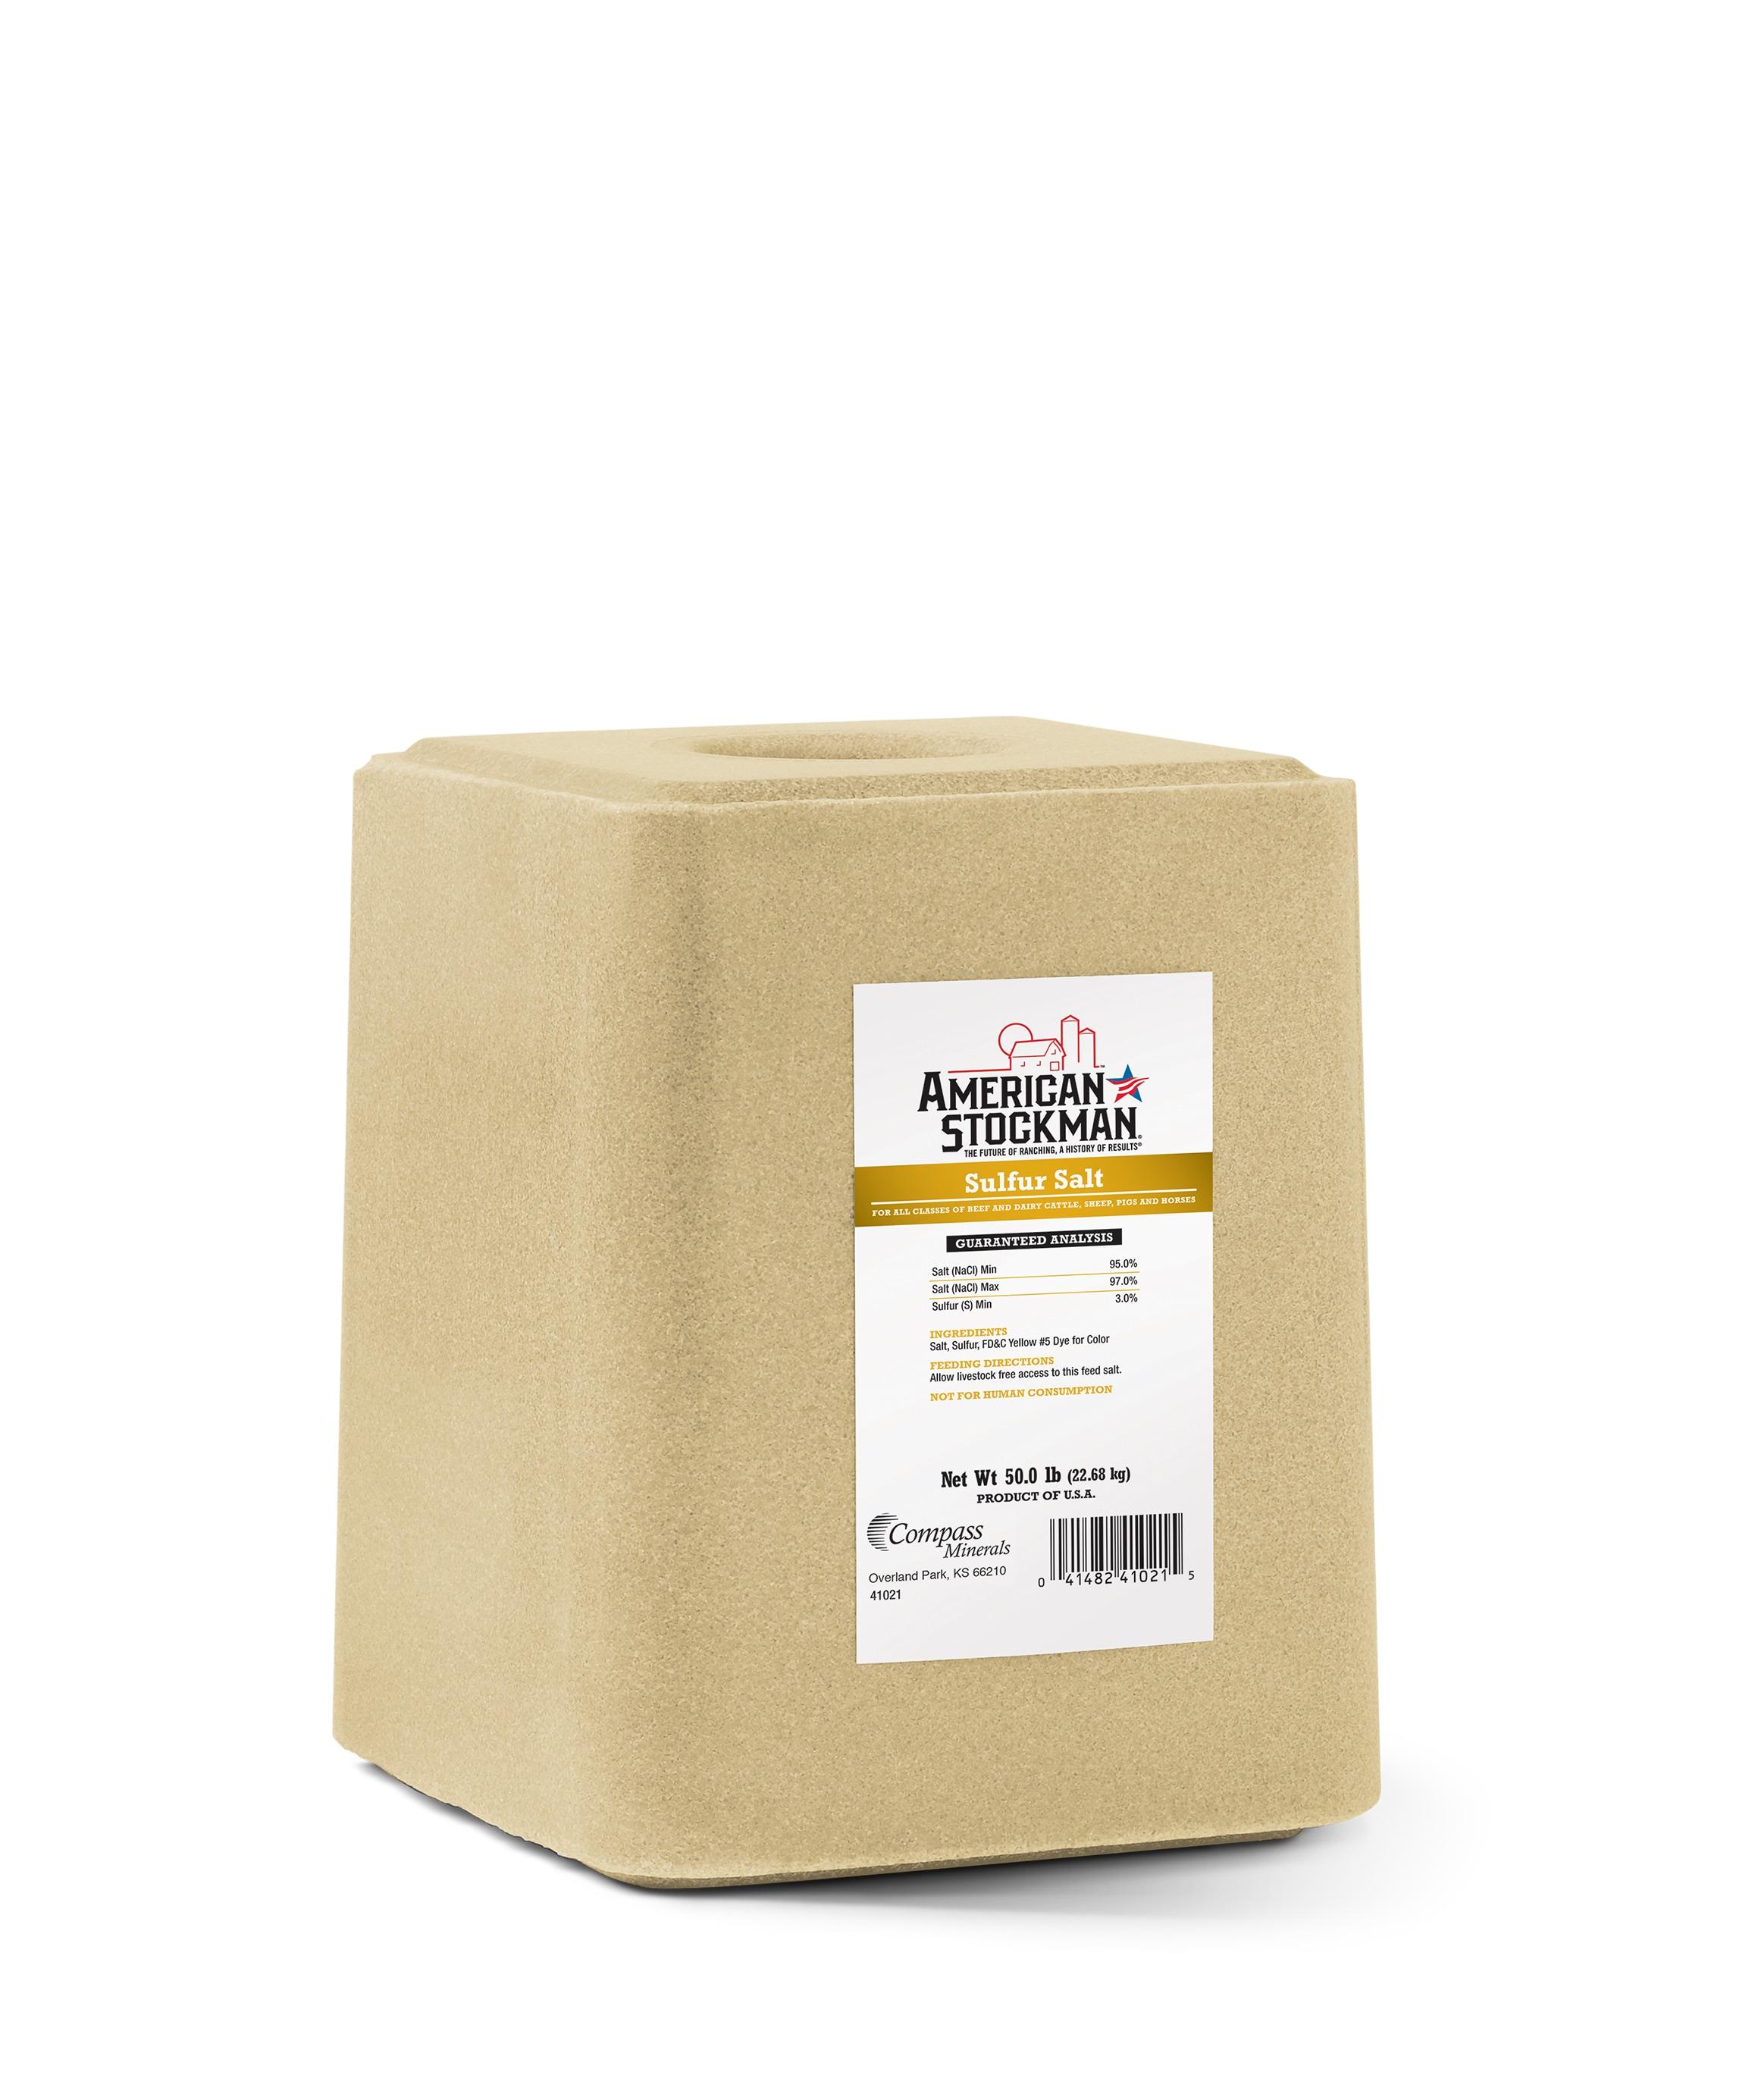 American Stockman® Sulfur Salt Bag